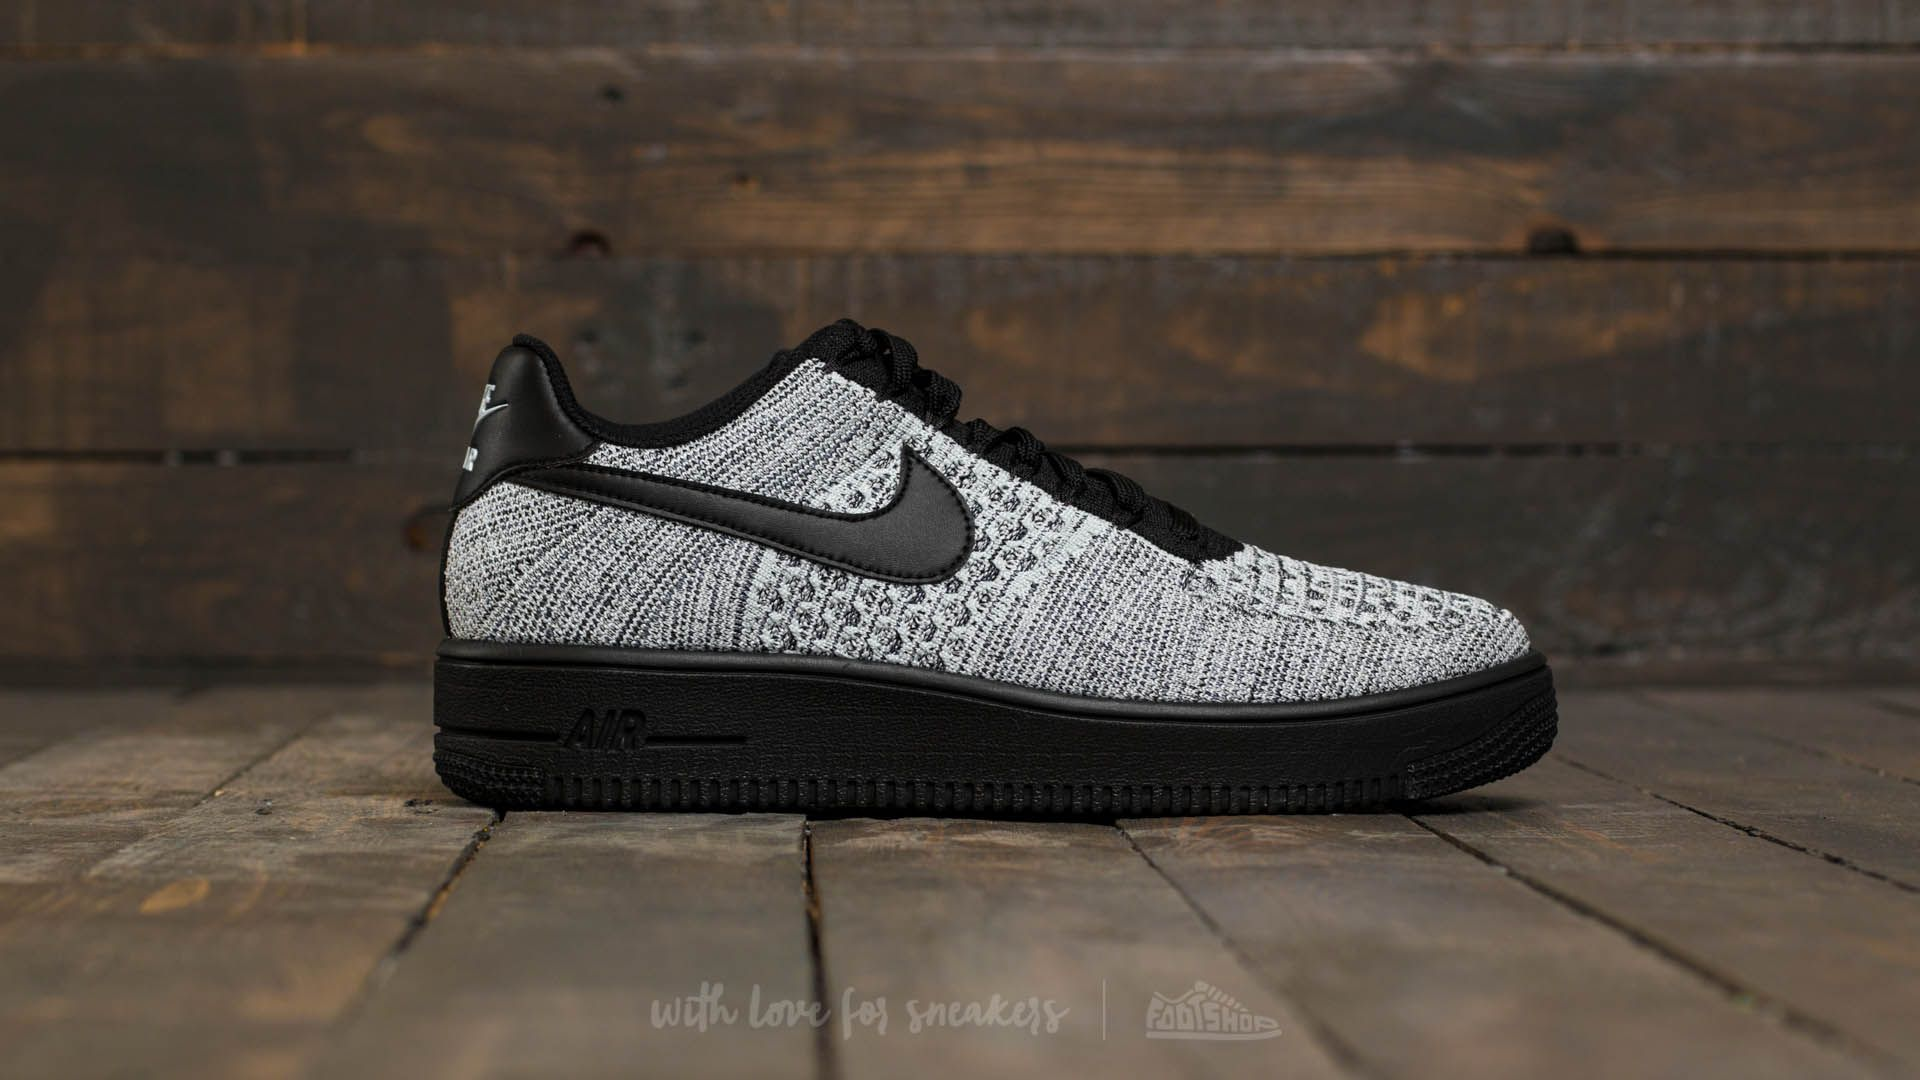 Nike Air Force 1 Ultra Flyknit Low Glacier Blue Black White | Footshop